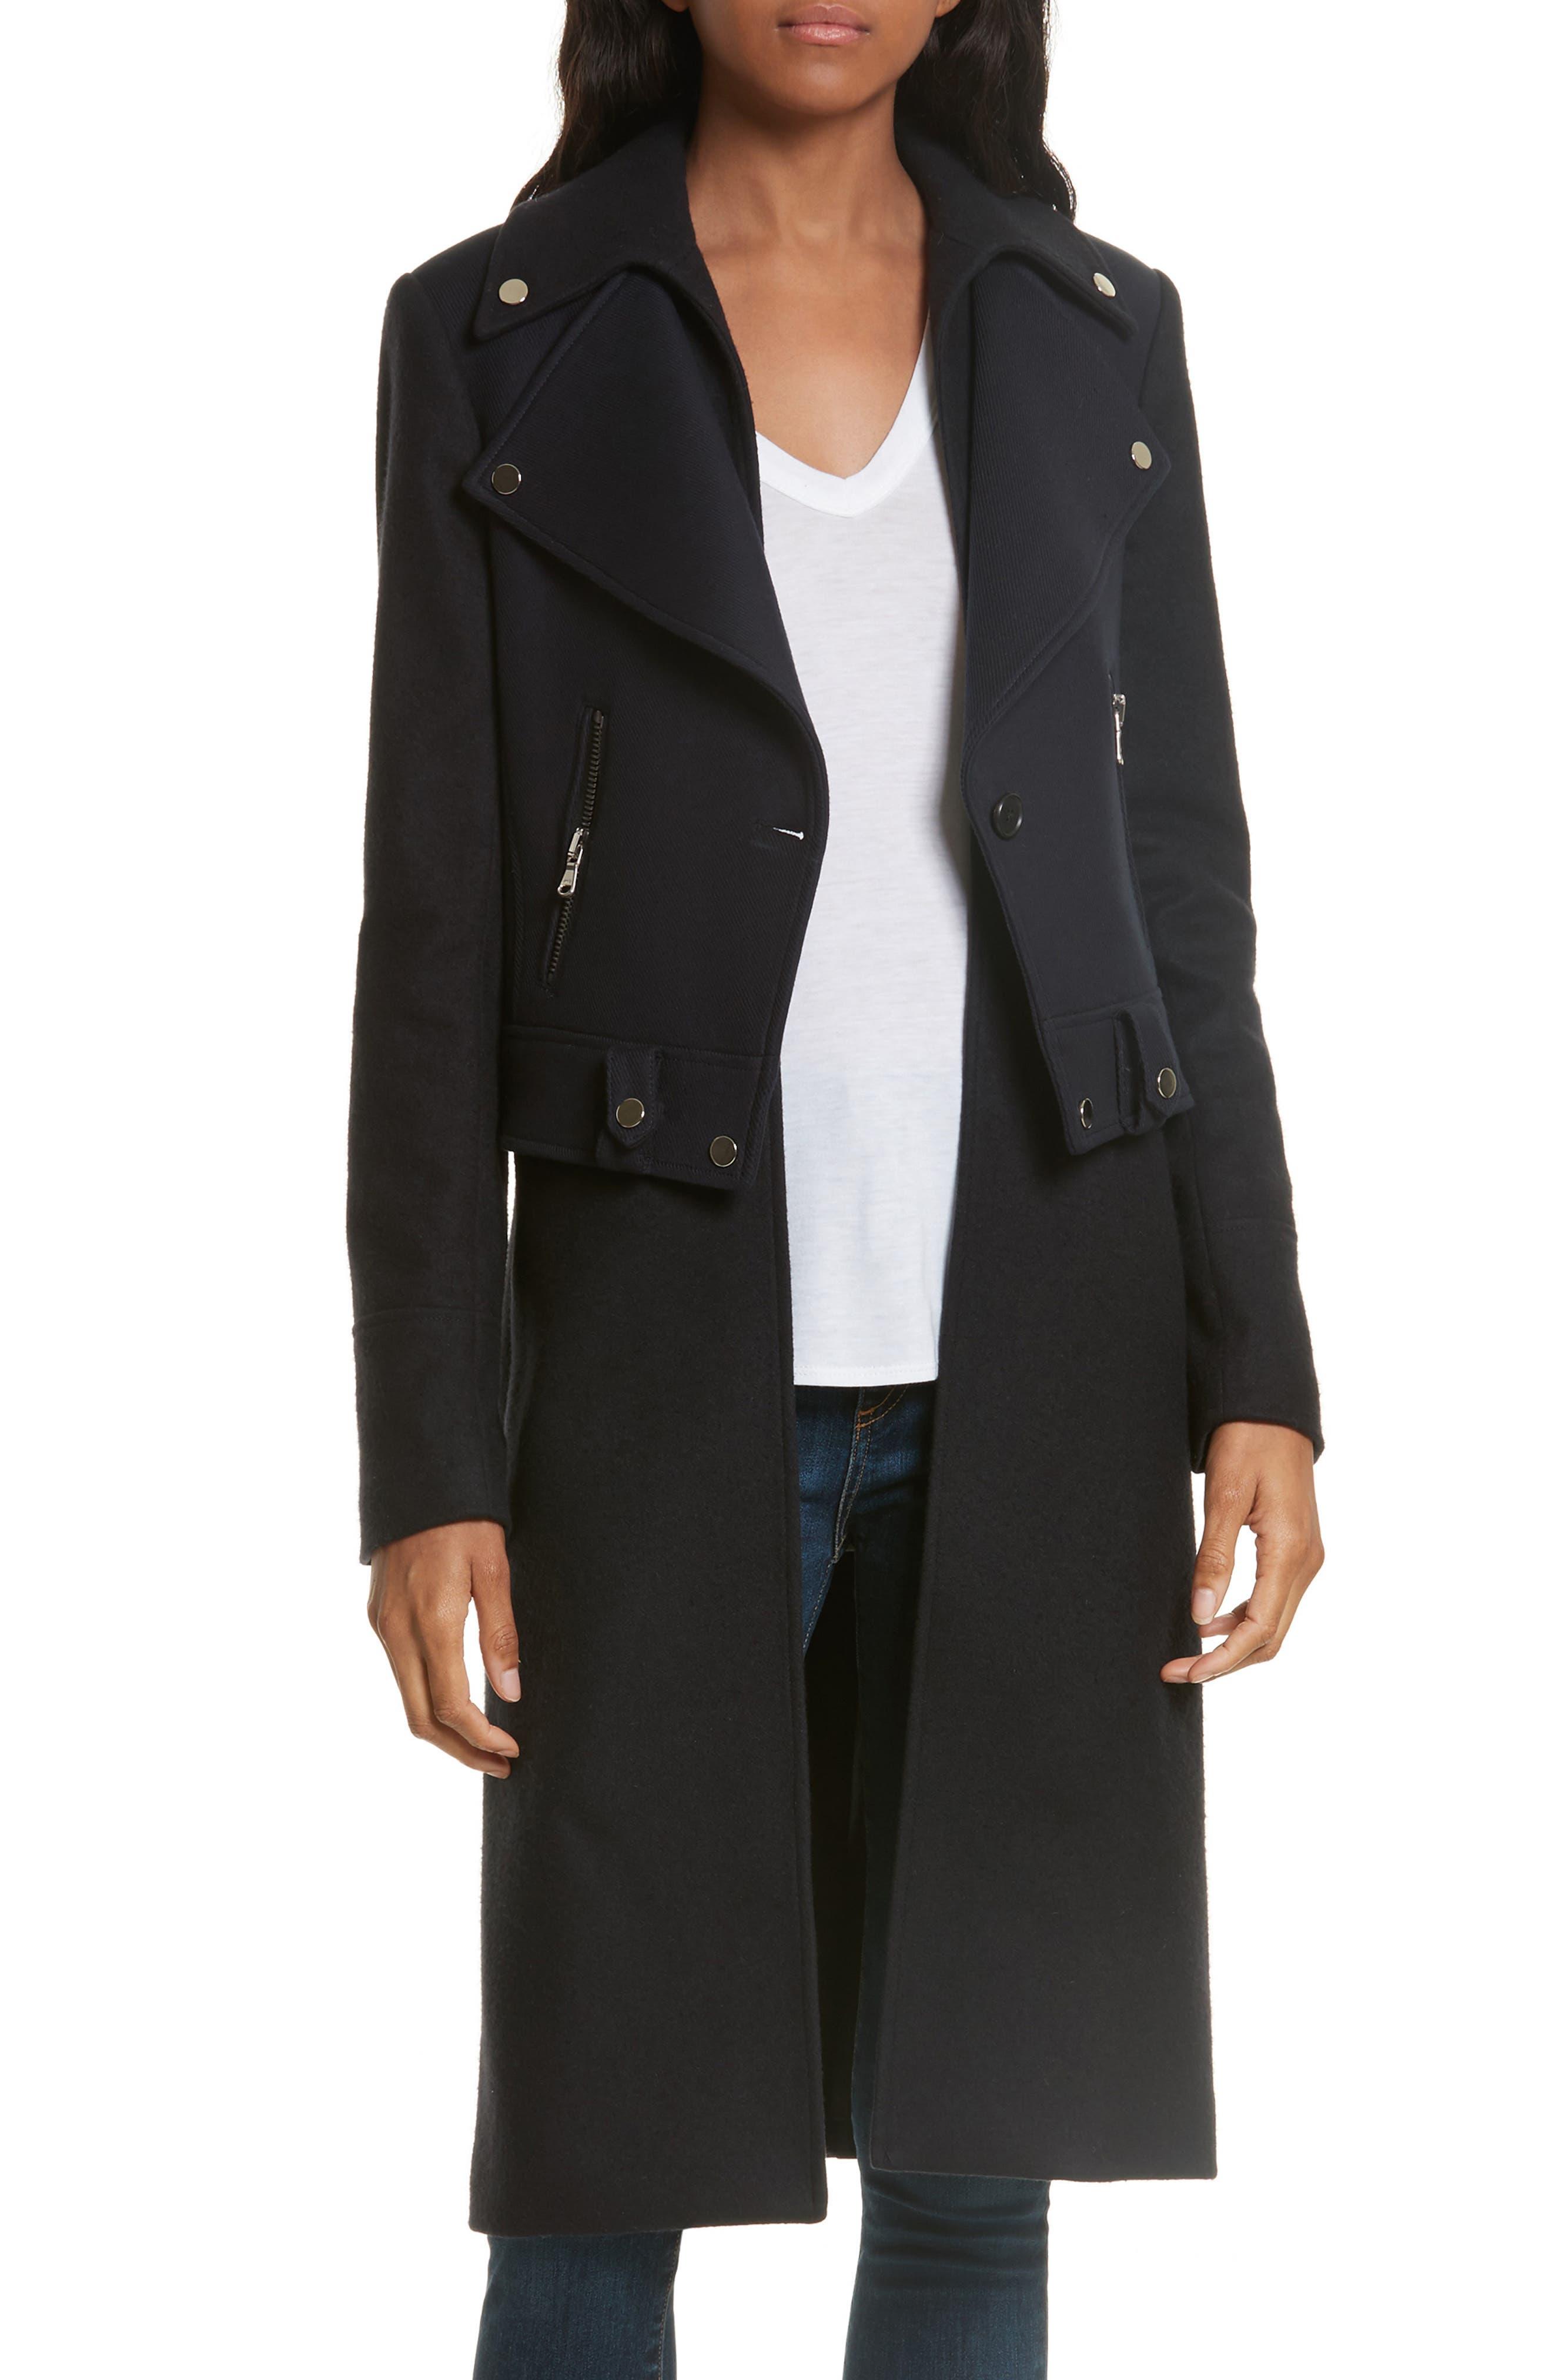 Alternate Image 1 Selected - Veronica Beard Alcott Wool & Cashmere Blend Vest Coat